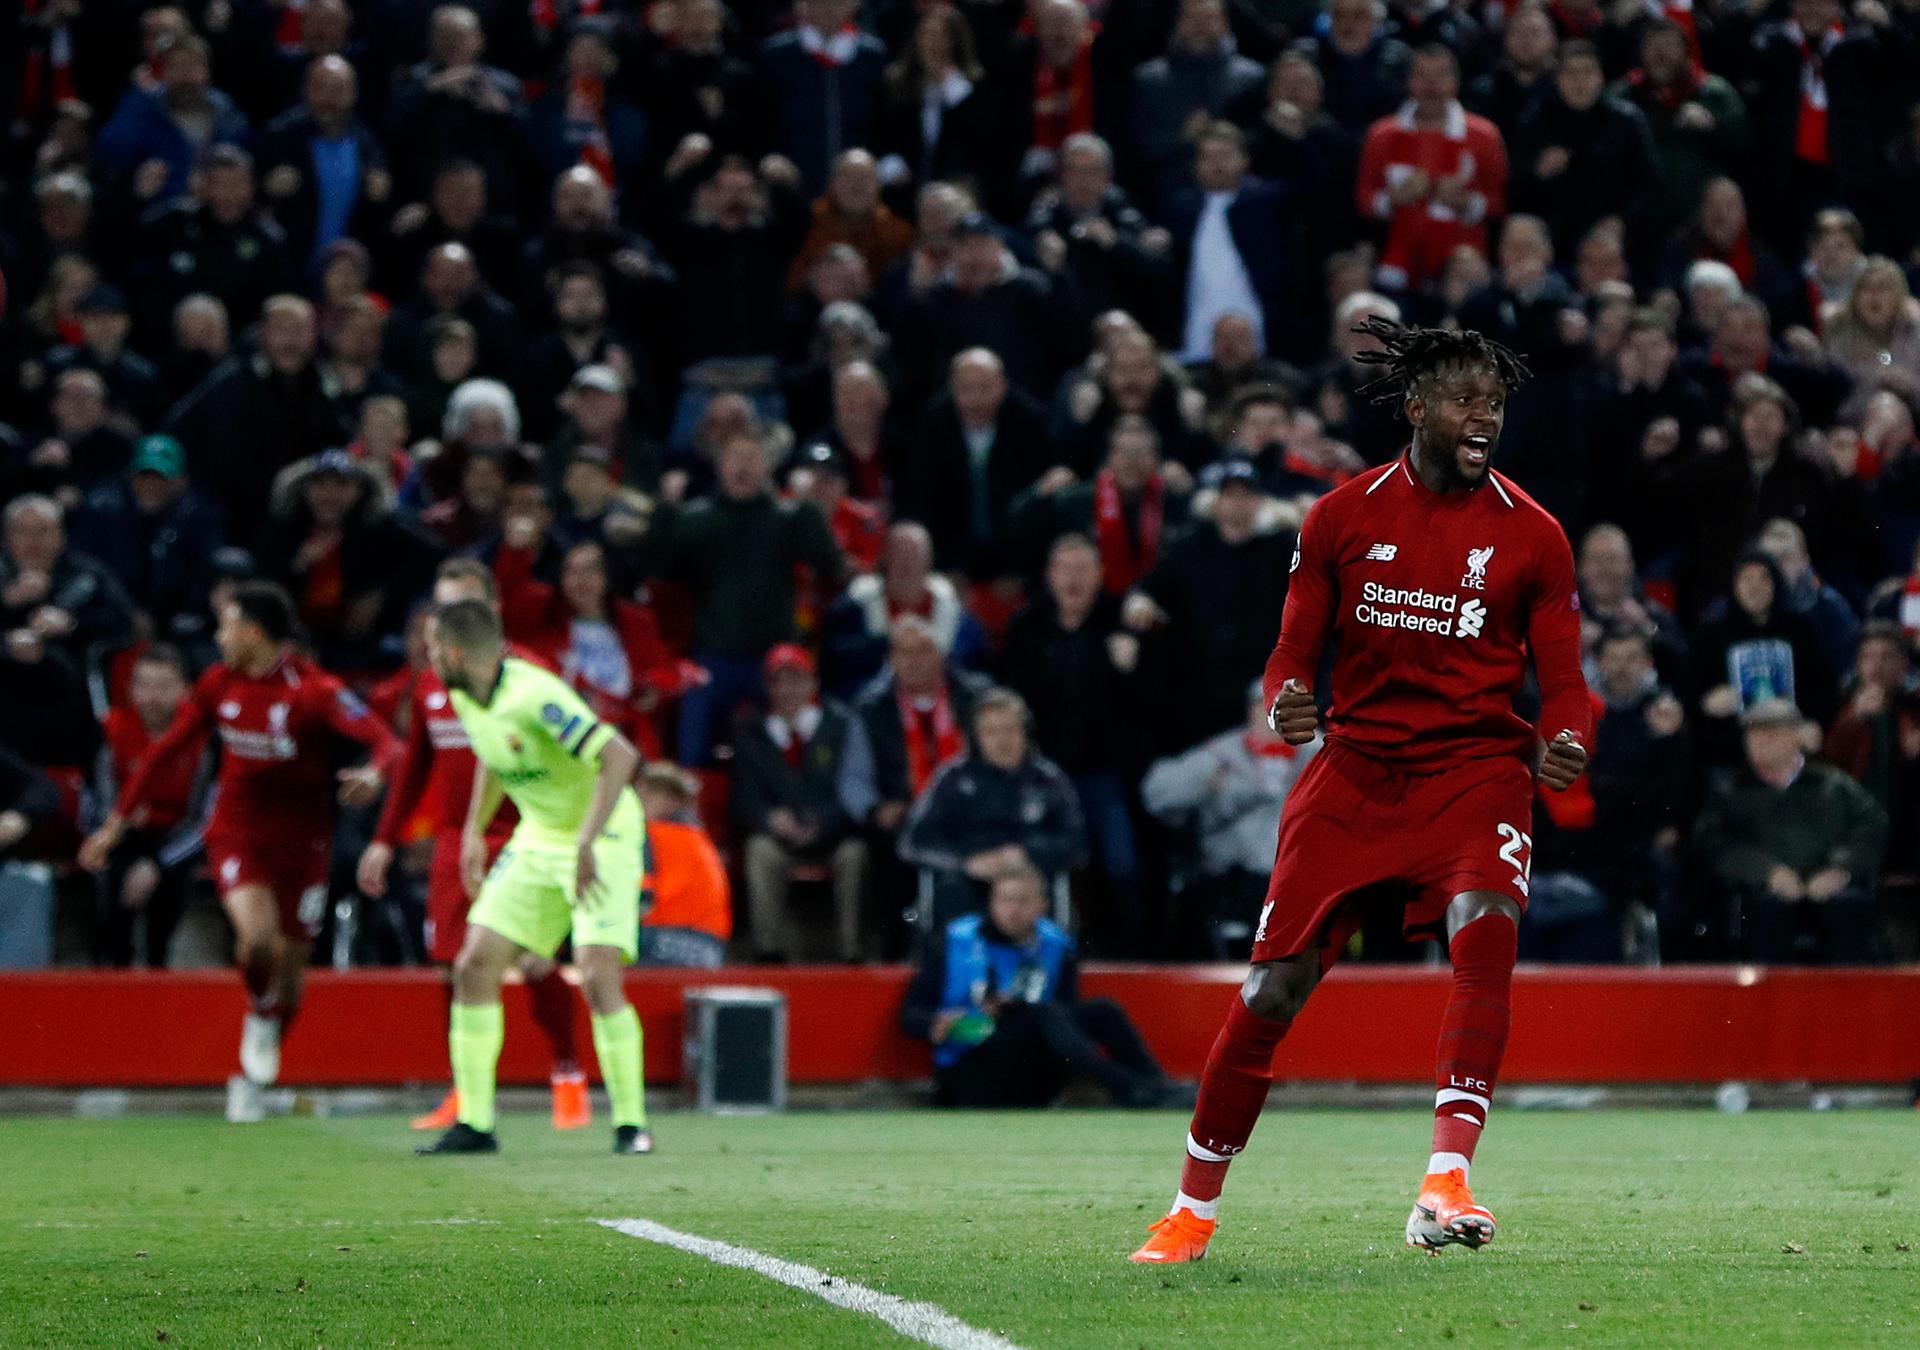 Mo Salah? No problem as Liverpool brush aside Barca at Anfield